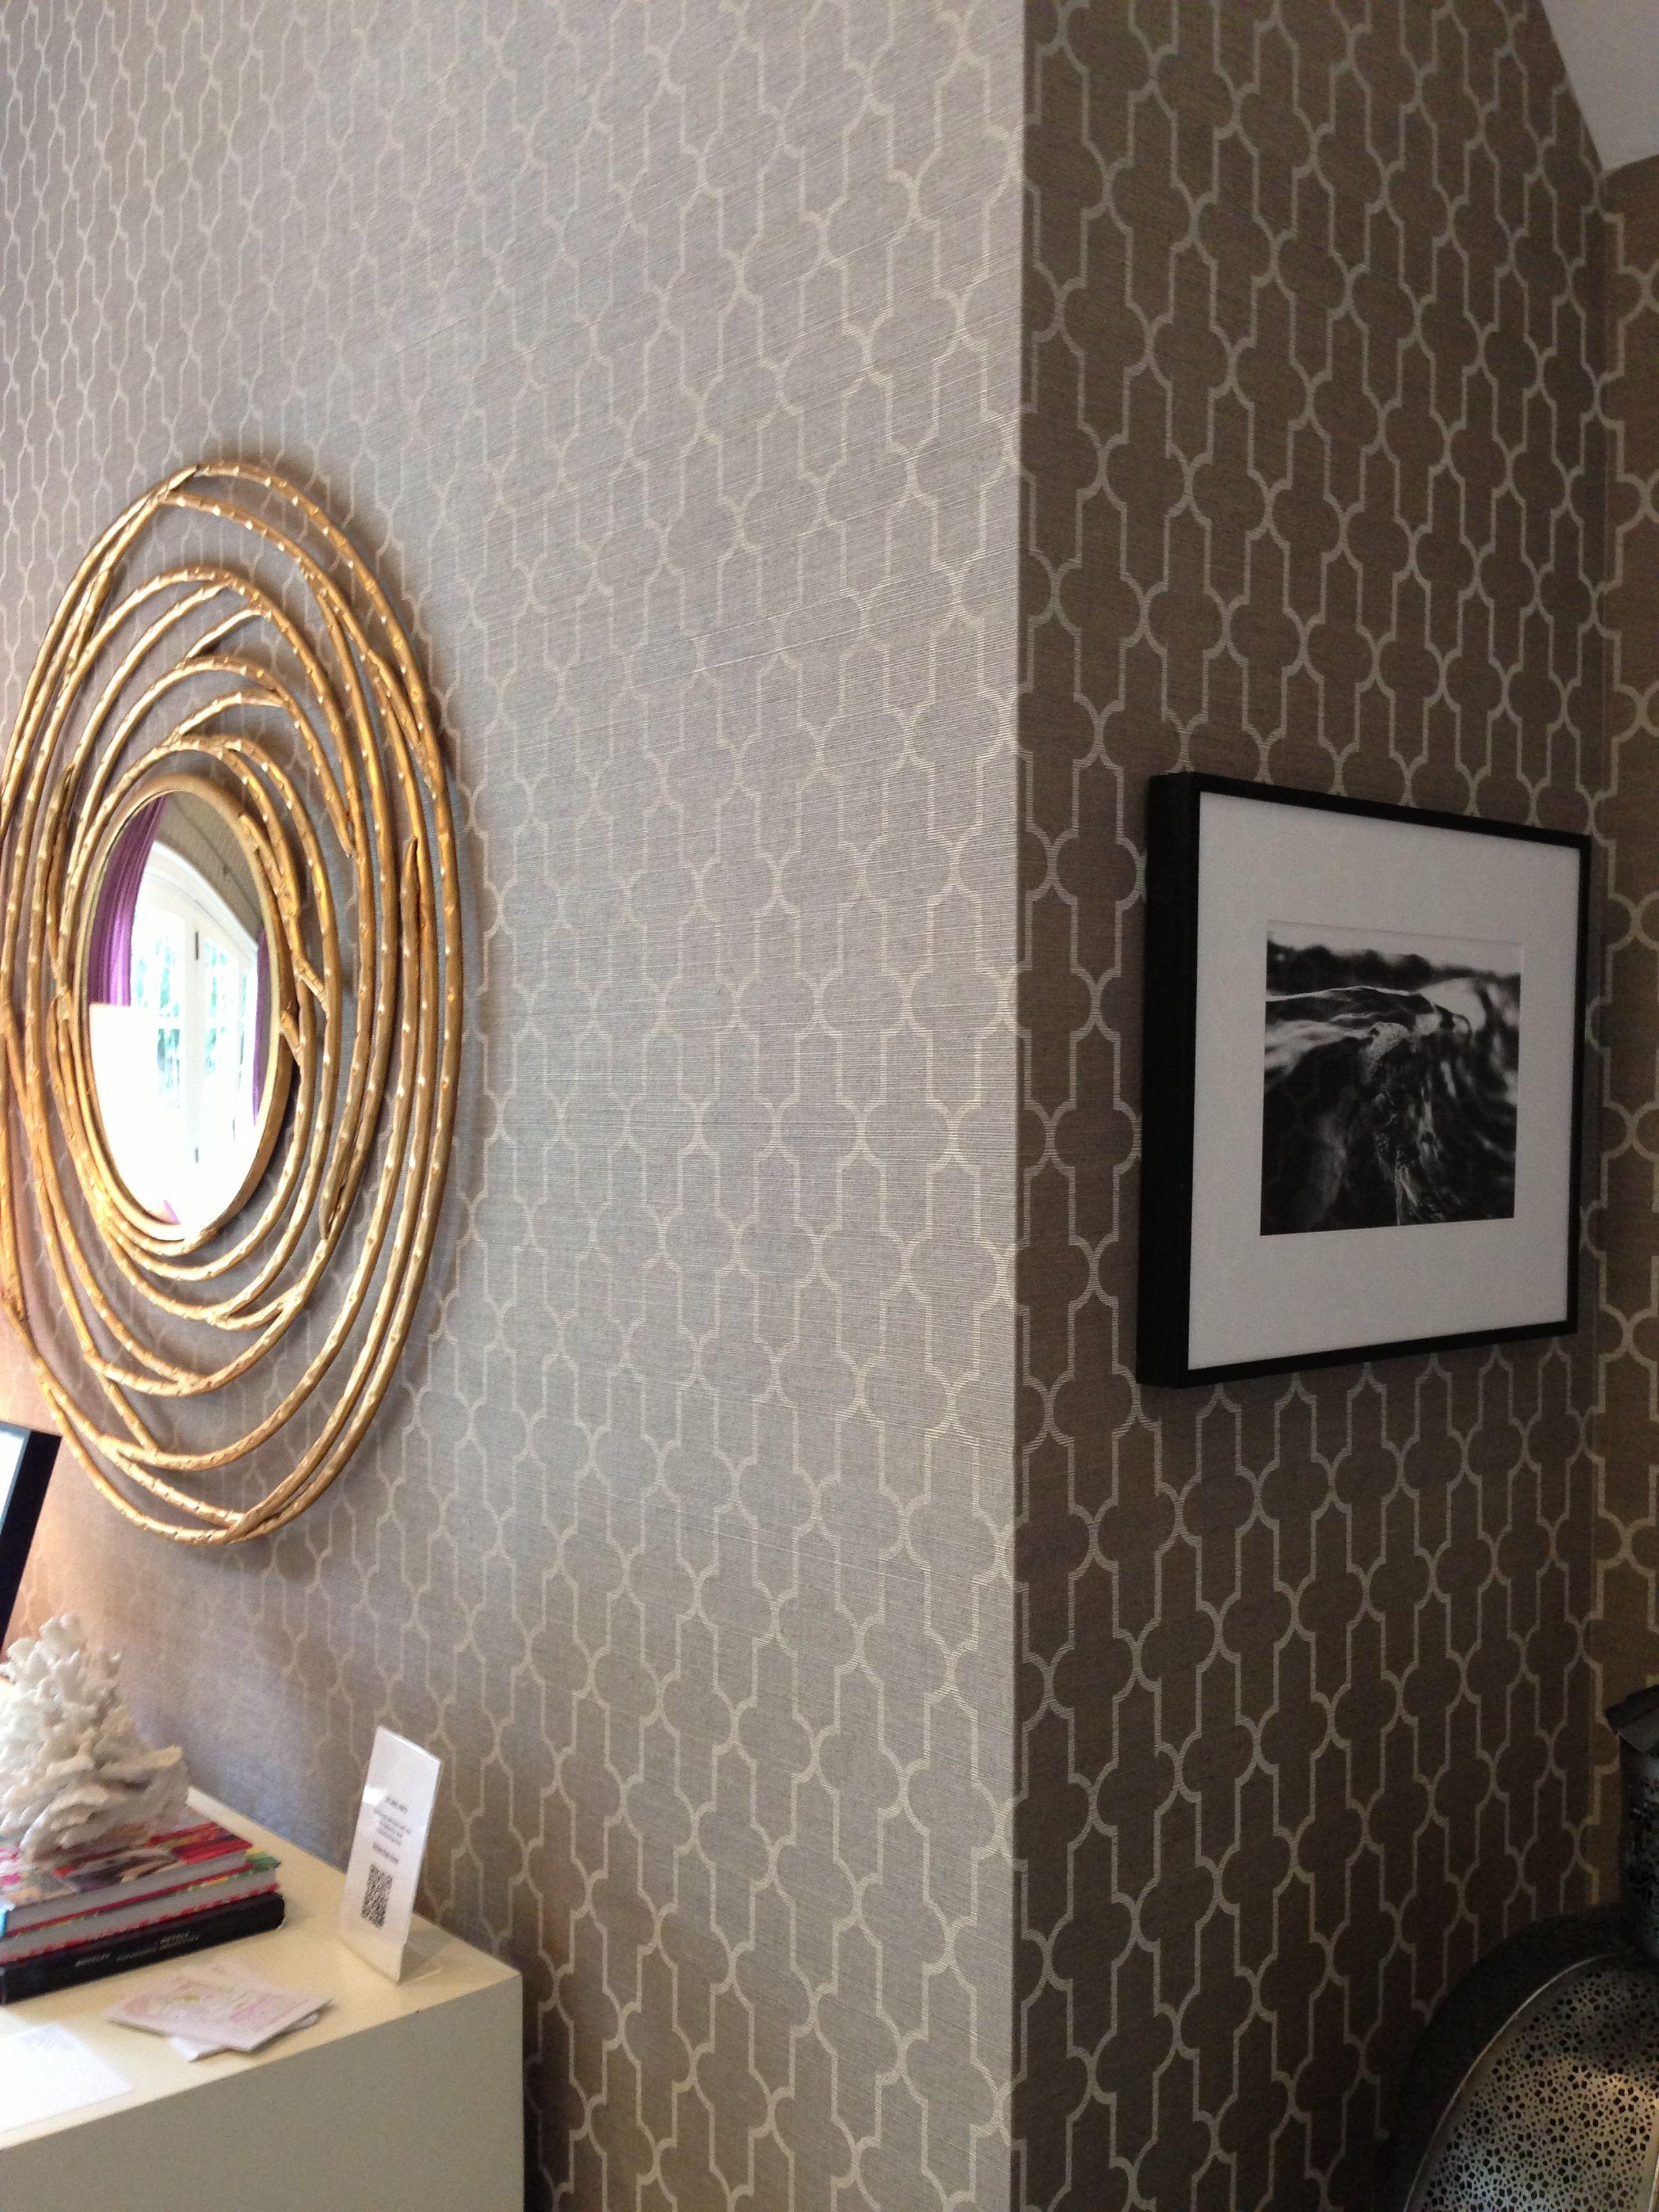 Wallpaper  Wallpaper accent wall, Accent walls in living room